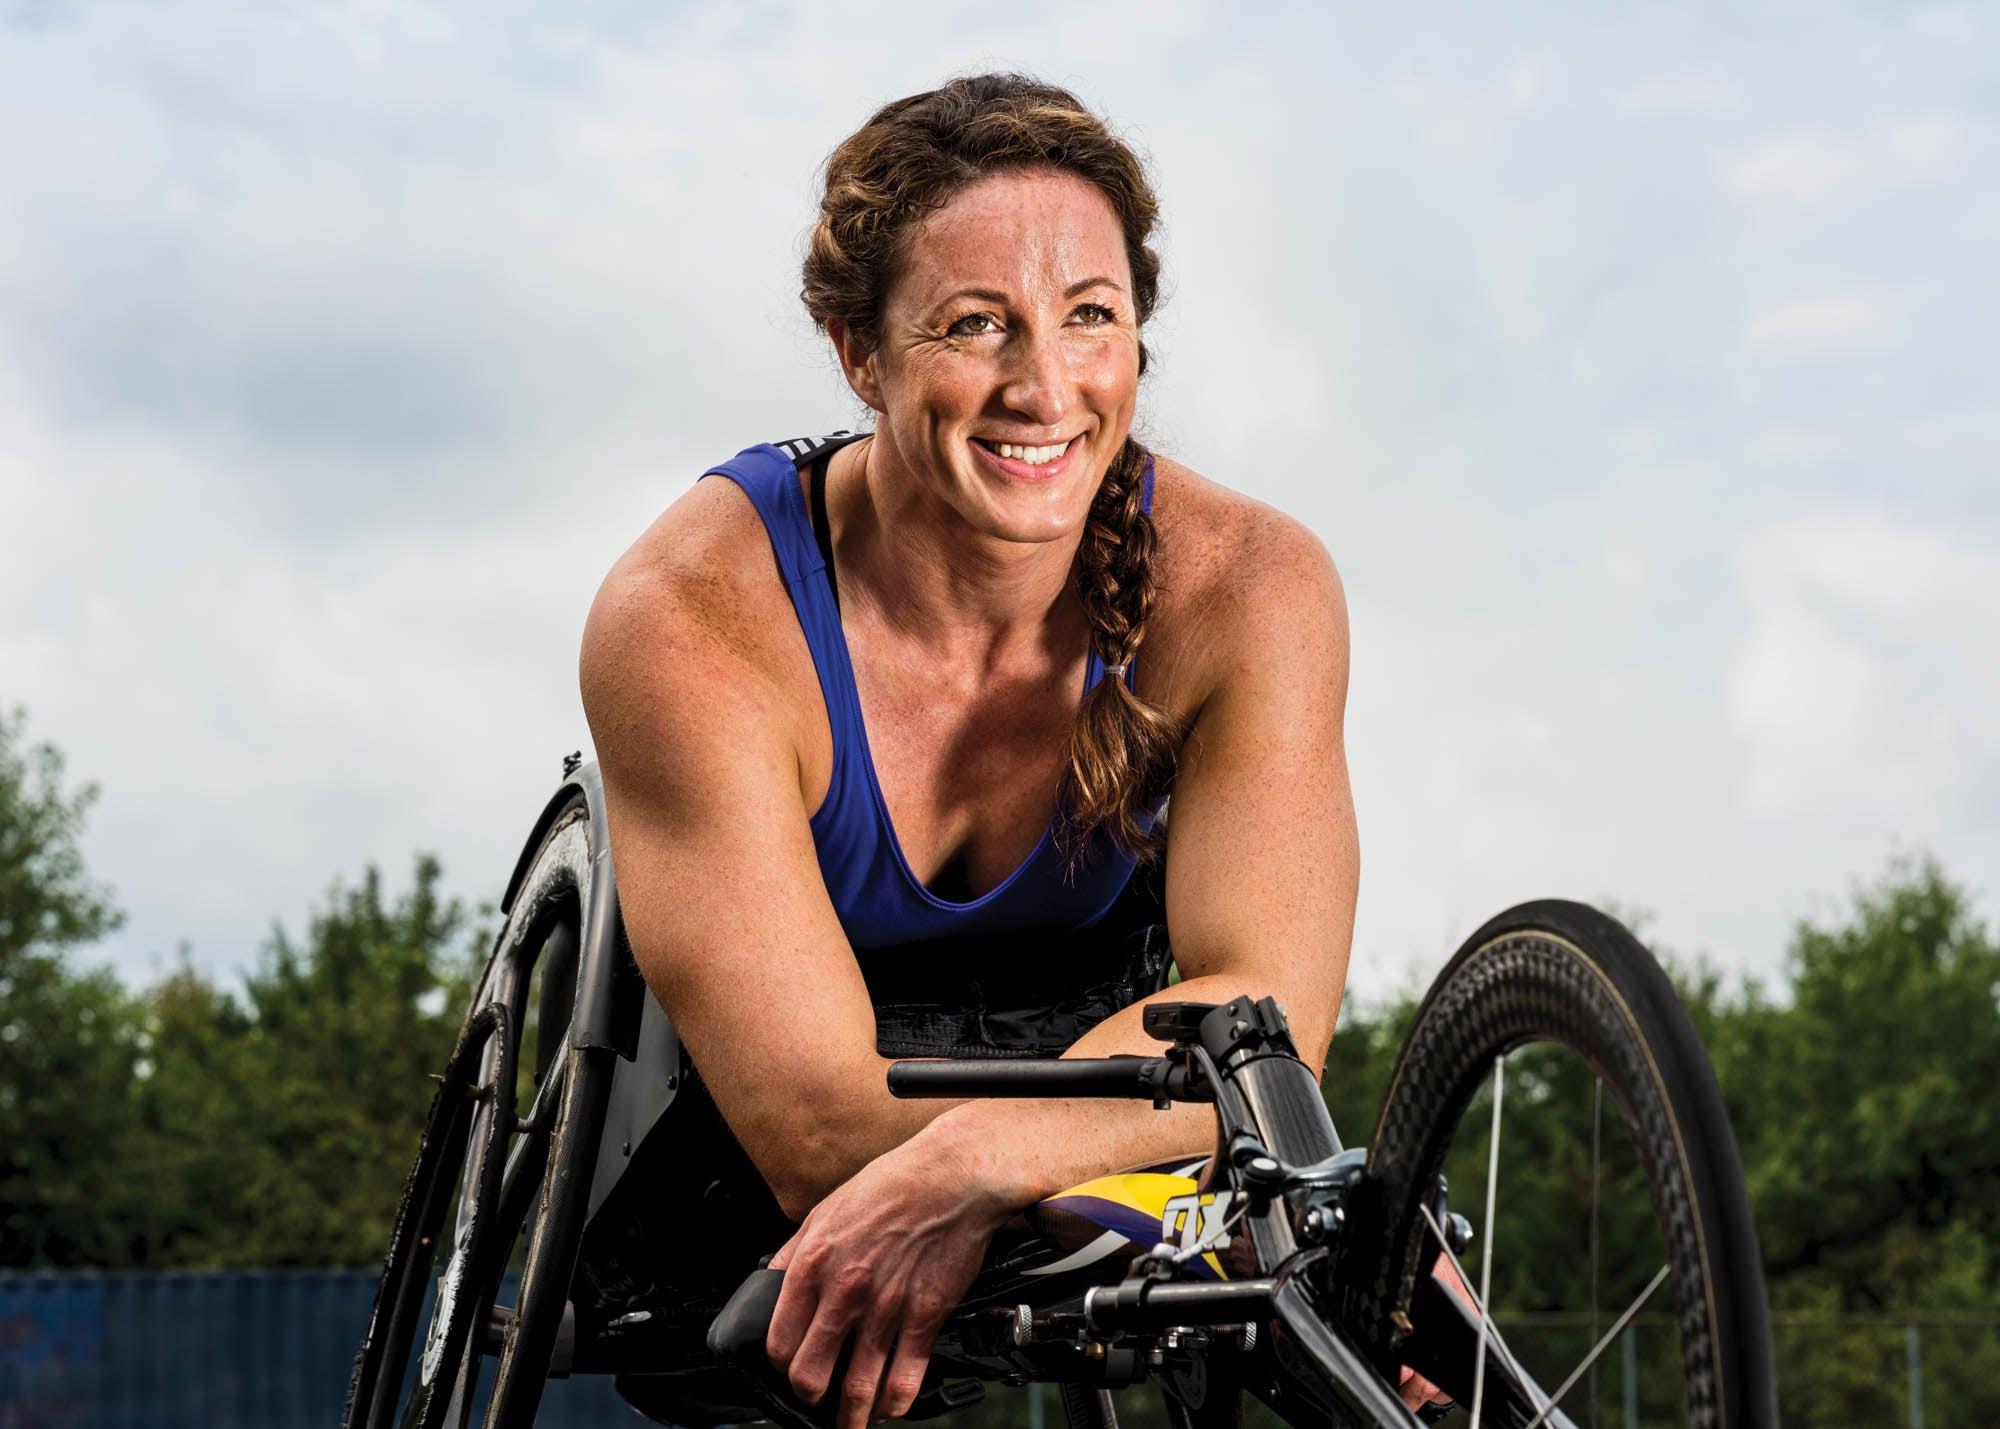 Portrait of McFadden outside in her racing wheelchair